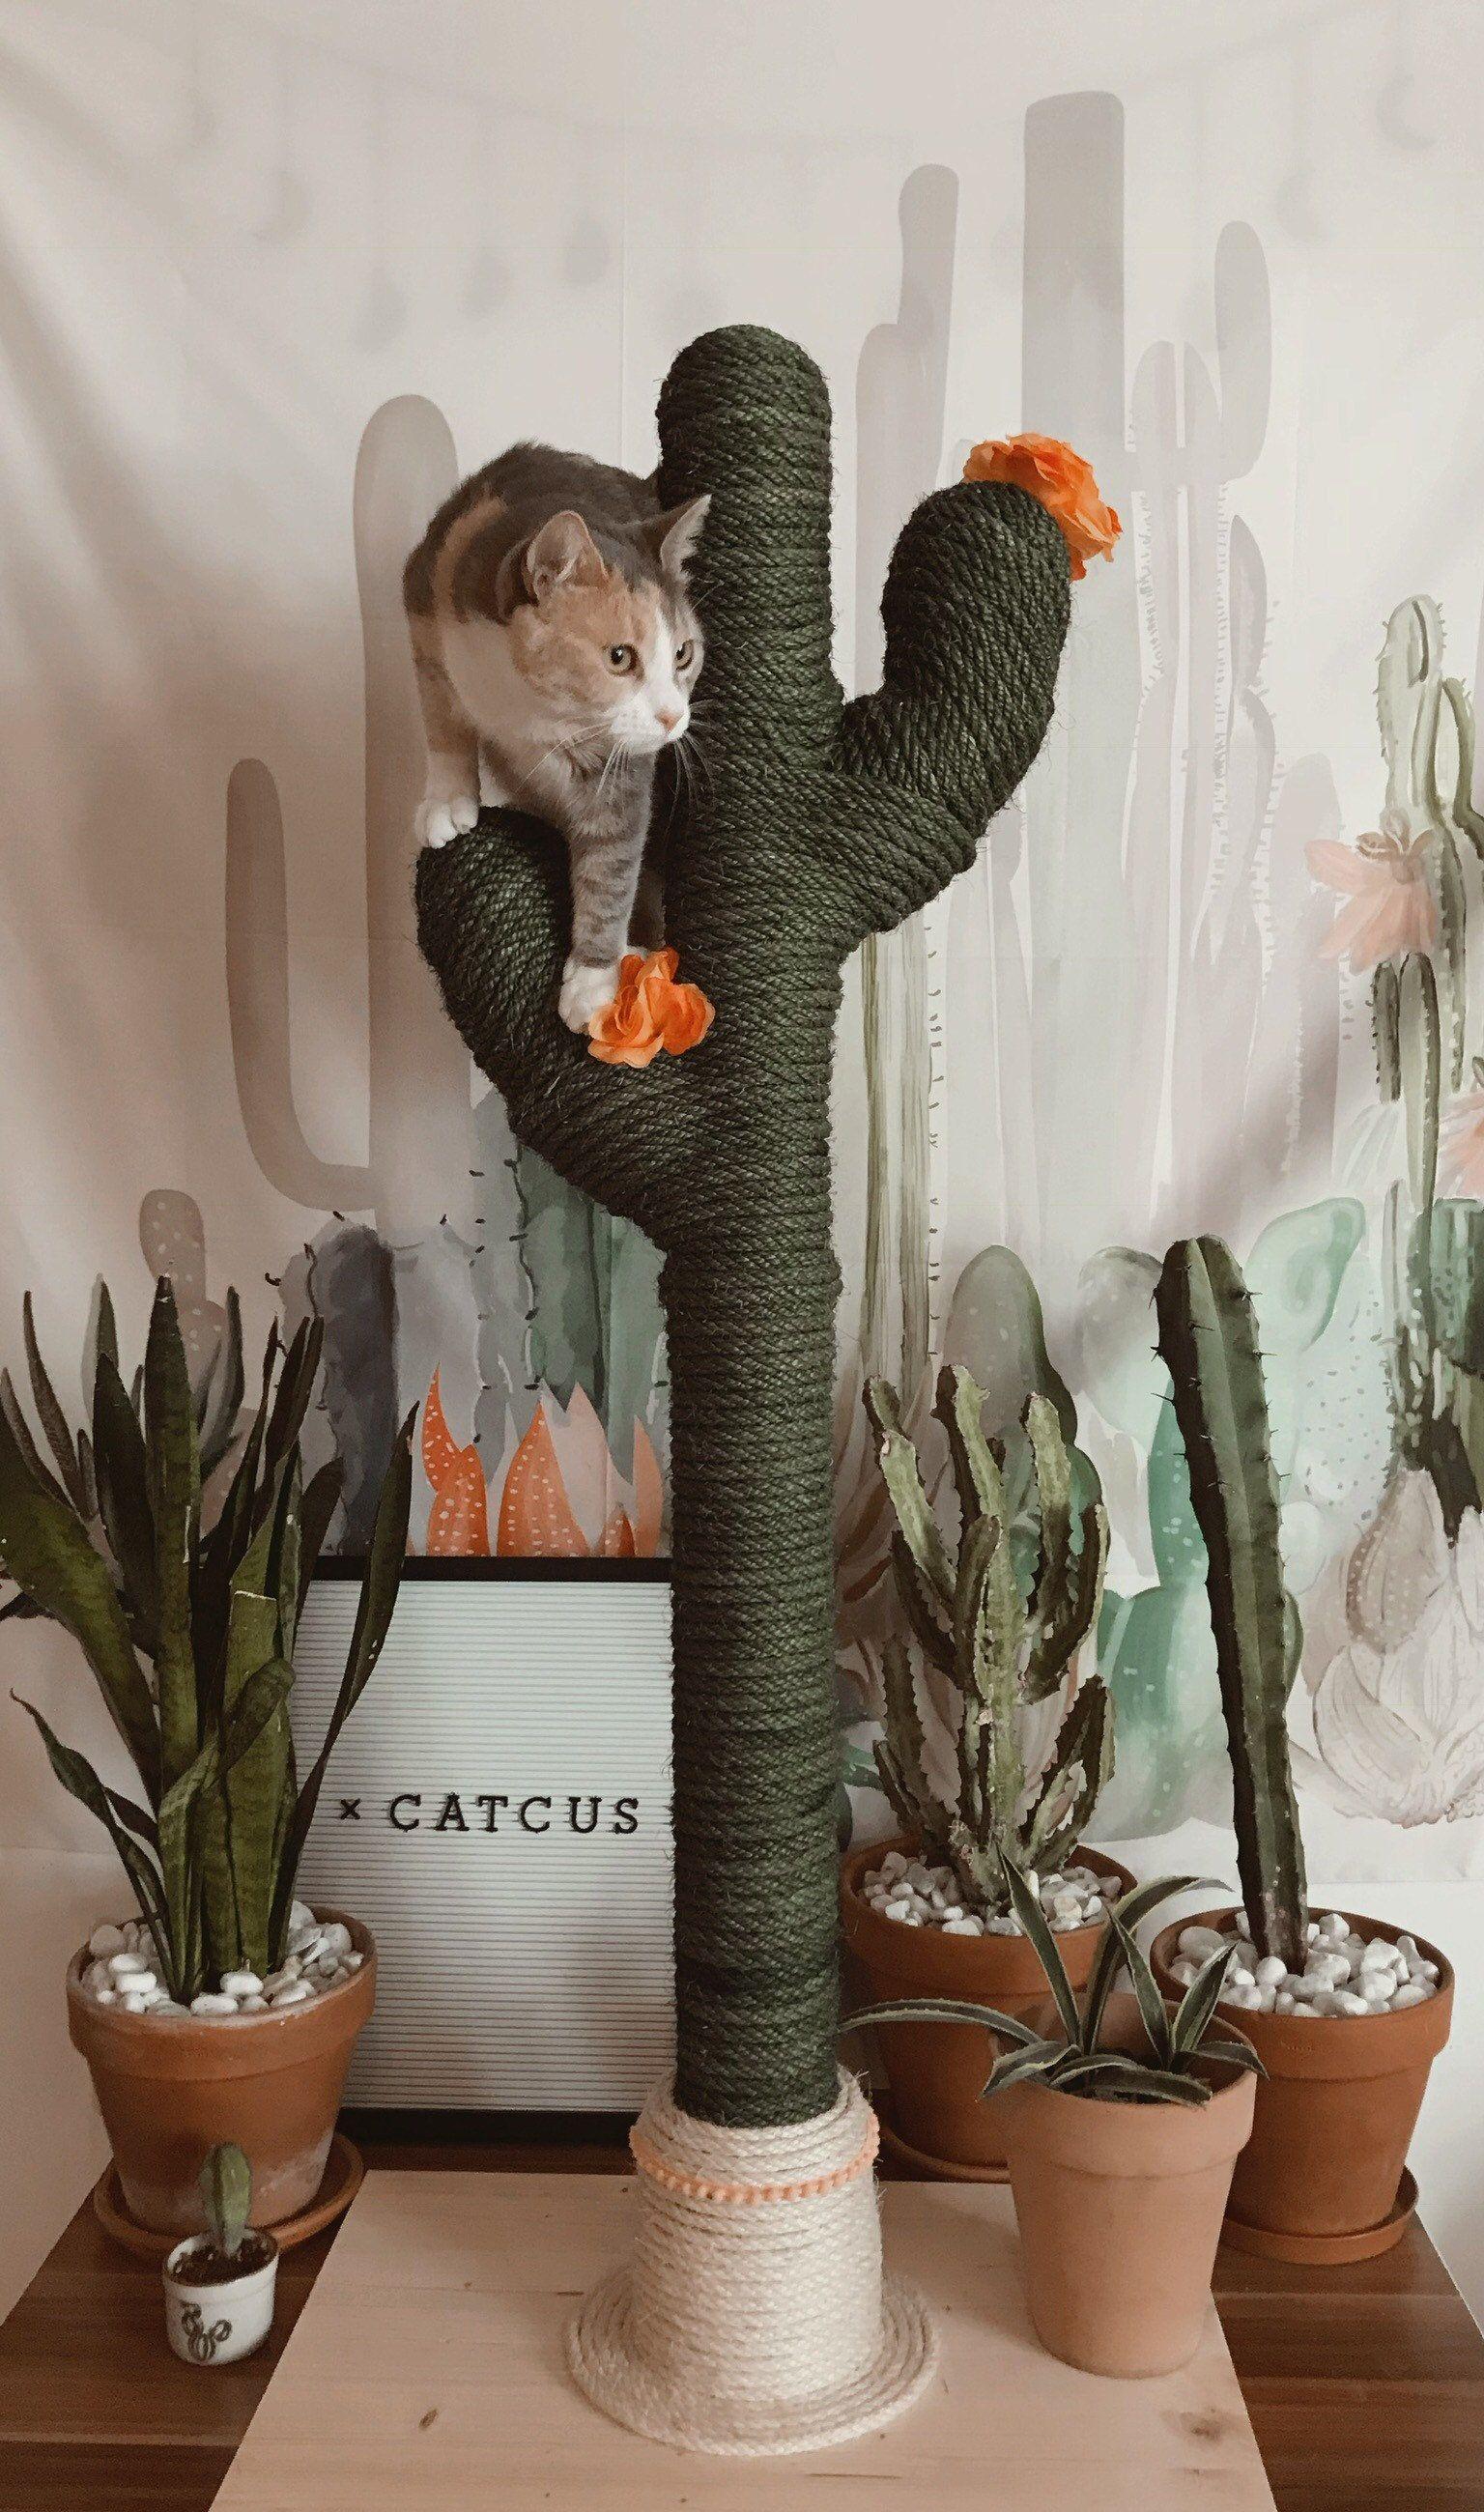 Cactus For Cats Catcus Scratching Post Cat Tree Boho Cat Tower Cat Tree Designs Diy Cat Tree Cat Scratching Post